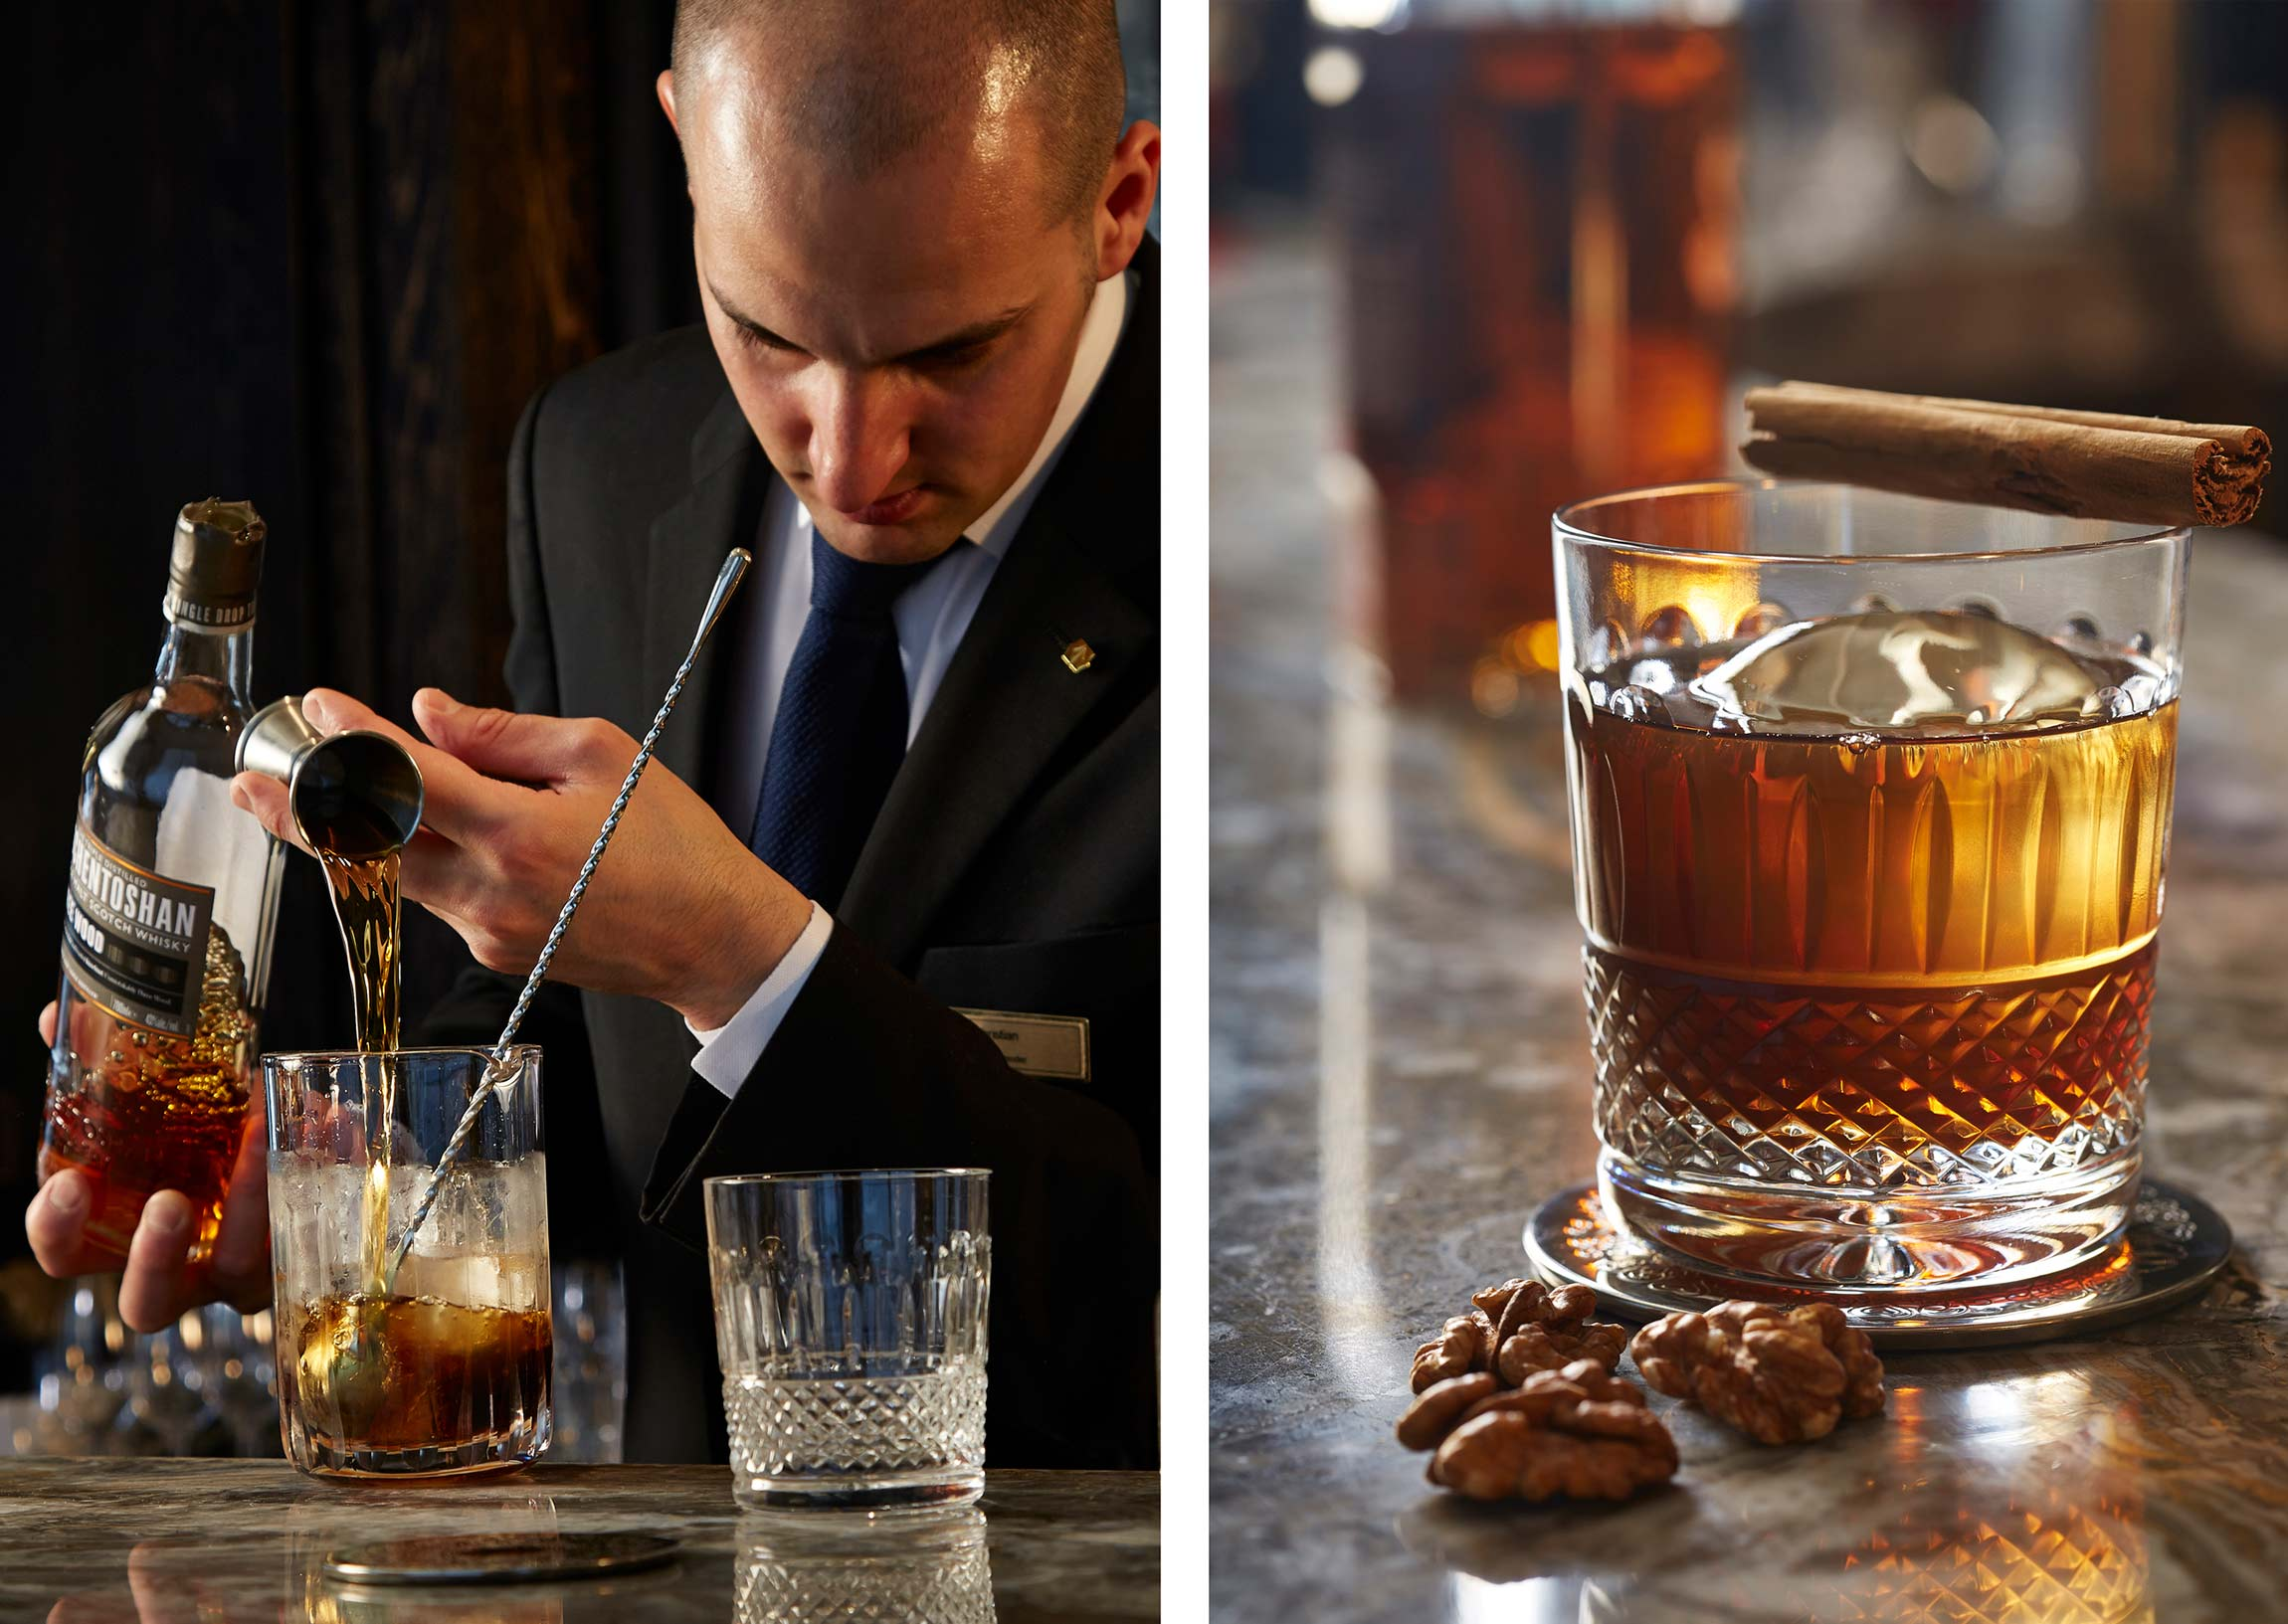 Shangri-La+cocktails.jpg